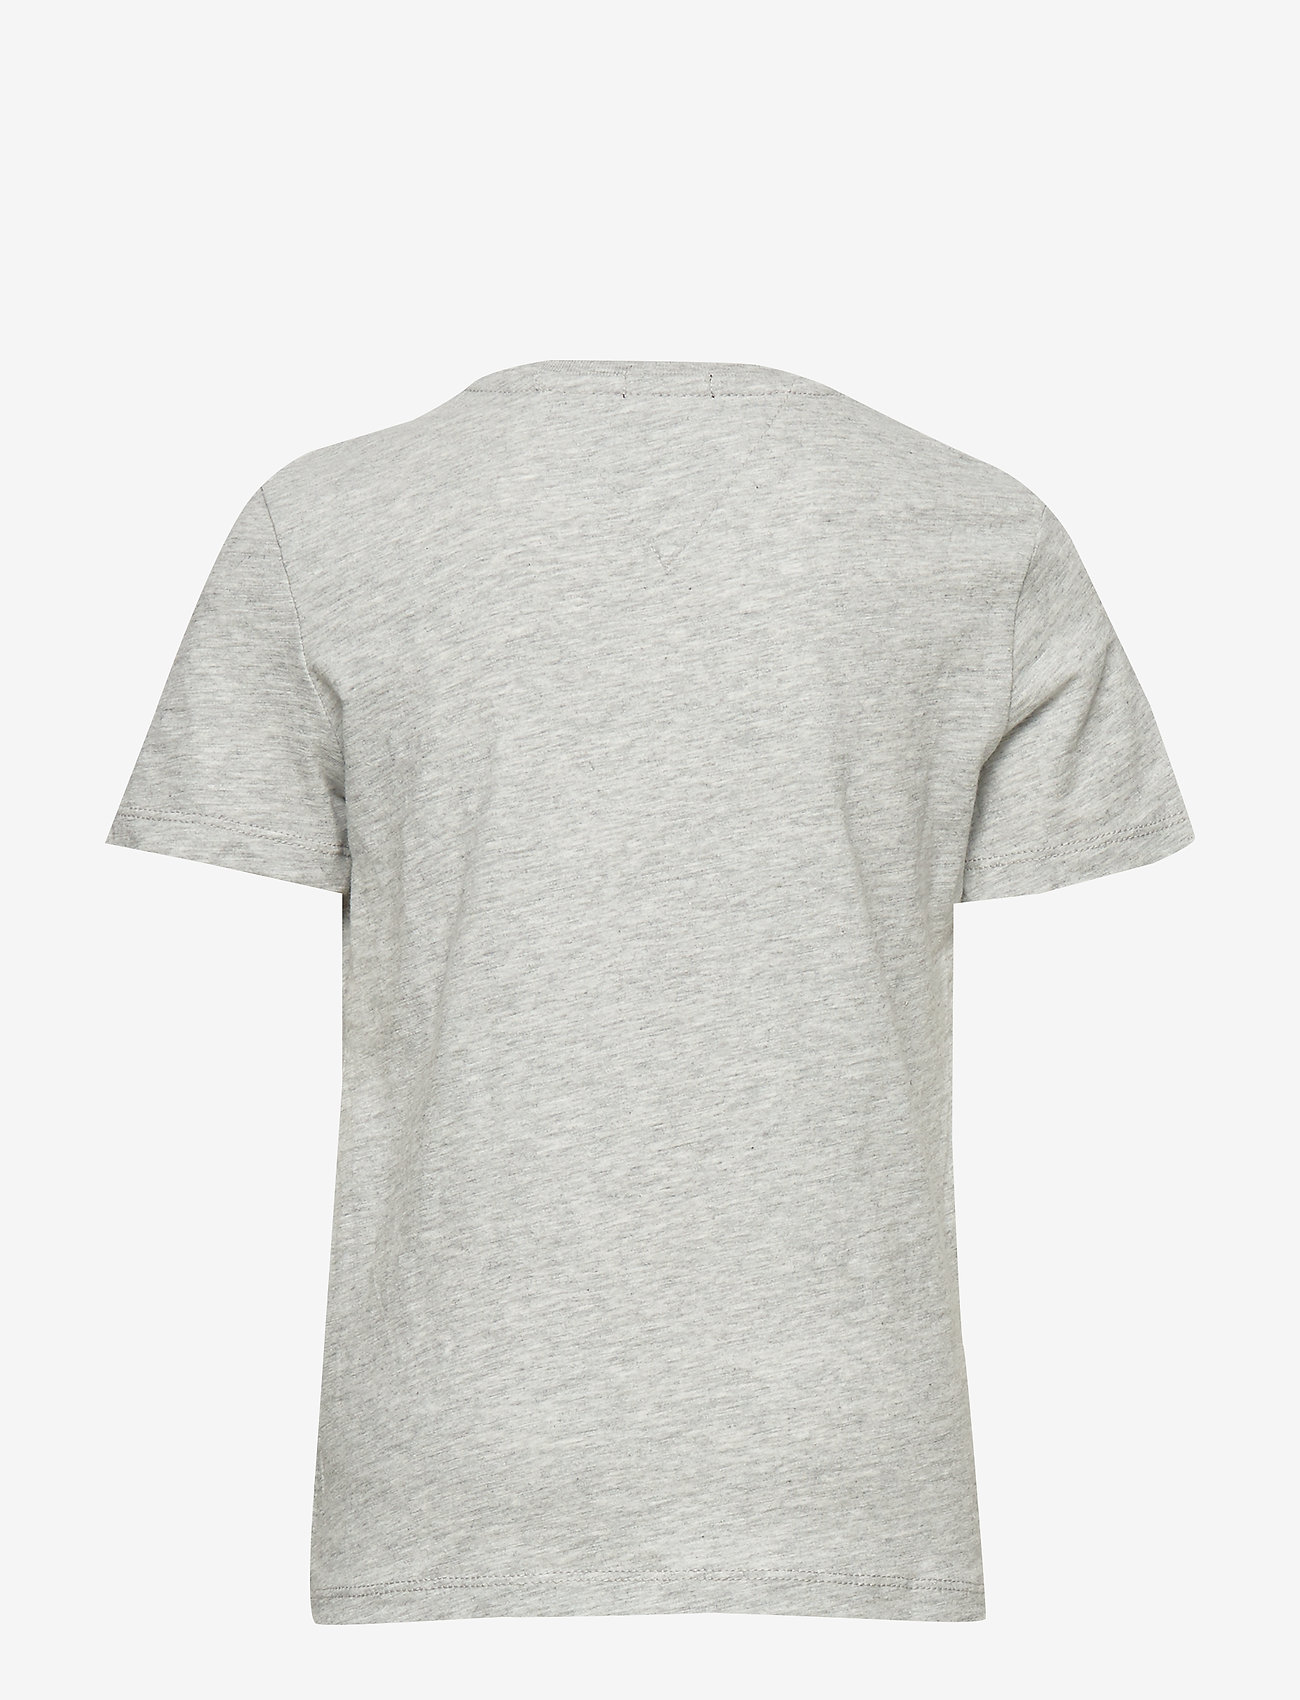 Tommy Hilfiger - ESSENTIAL LOGO TEE S - short-sleeved - light grey heather bc04 vol32 - 1